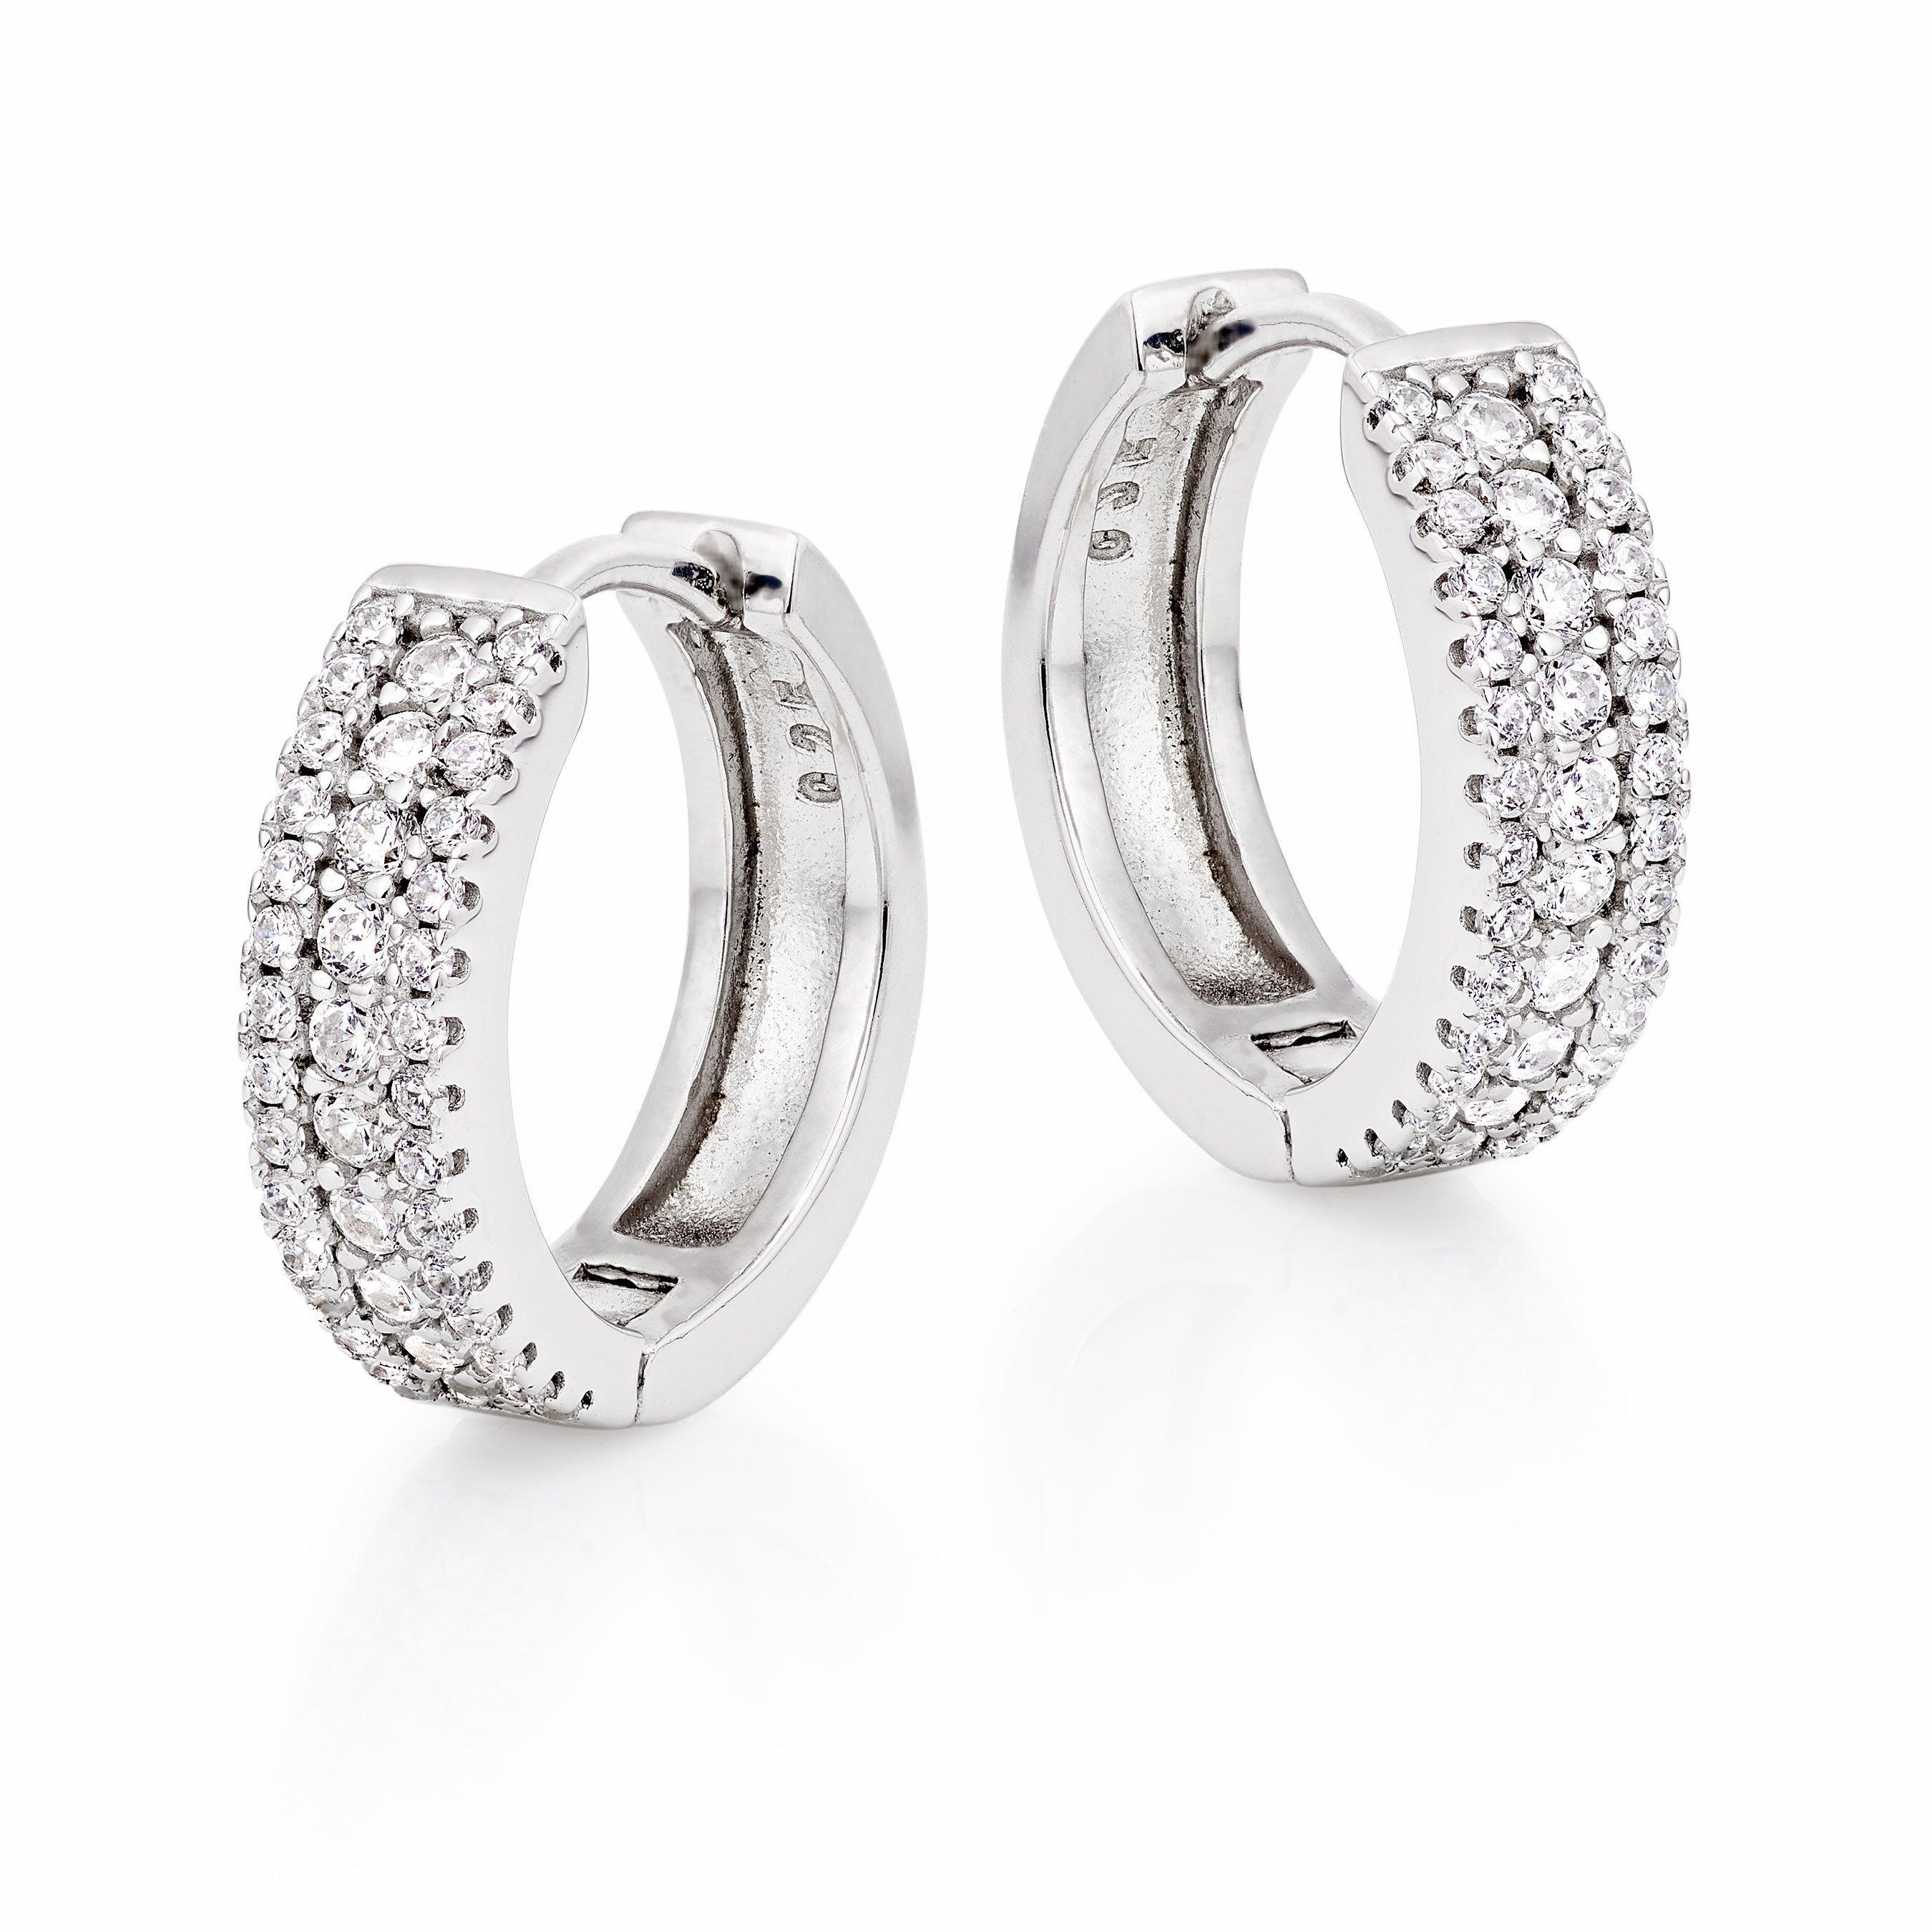 Silver Cubic Zirconia Triple Row Hoop Earrings